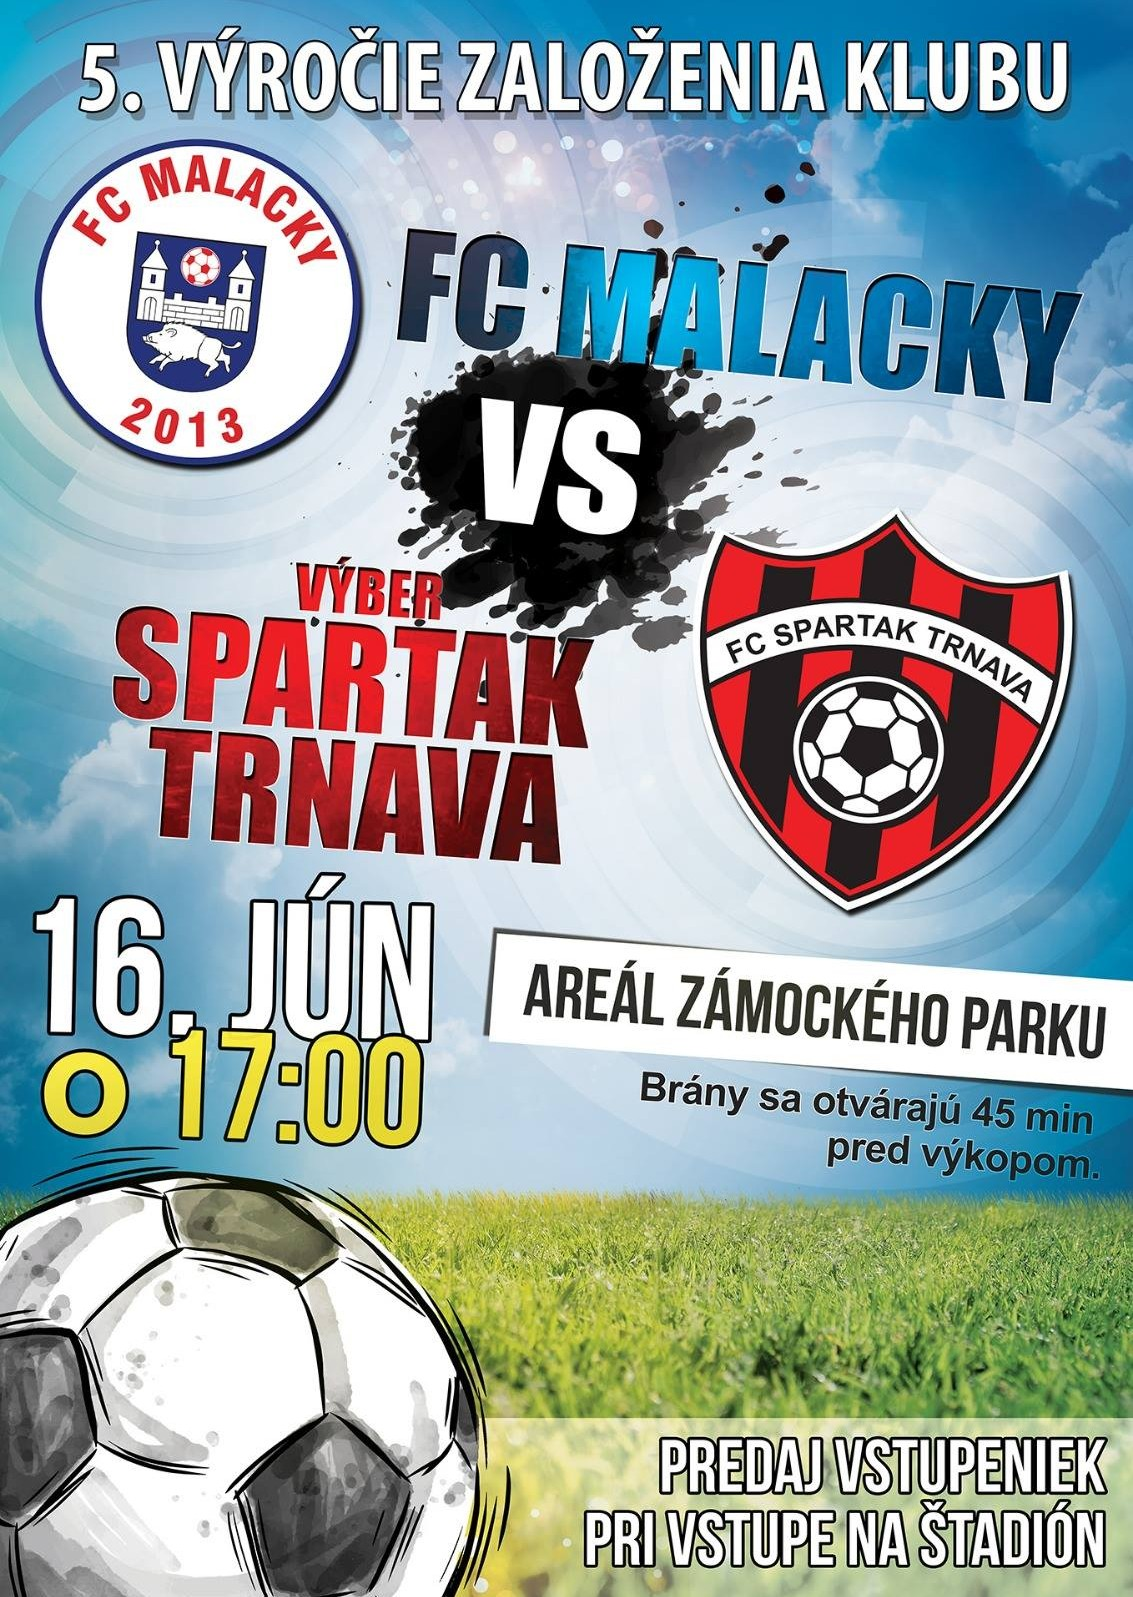 FC MALACKY - 5. výročie založenia klubu